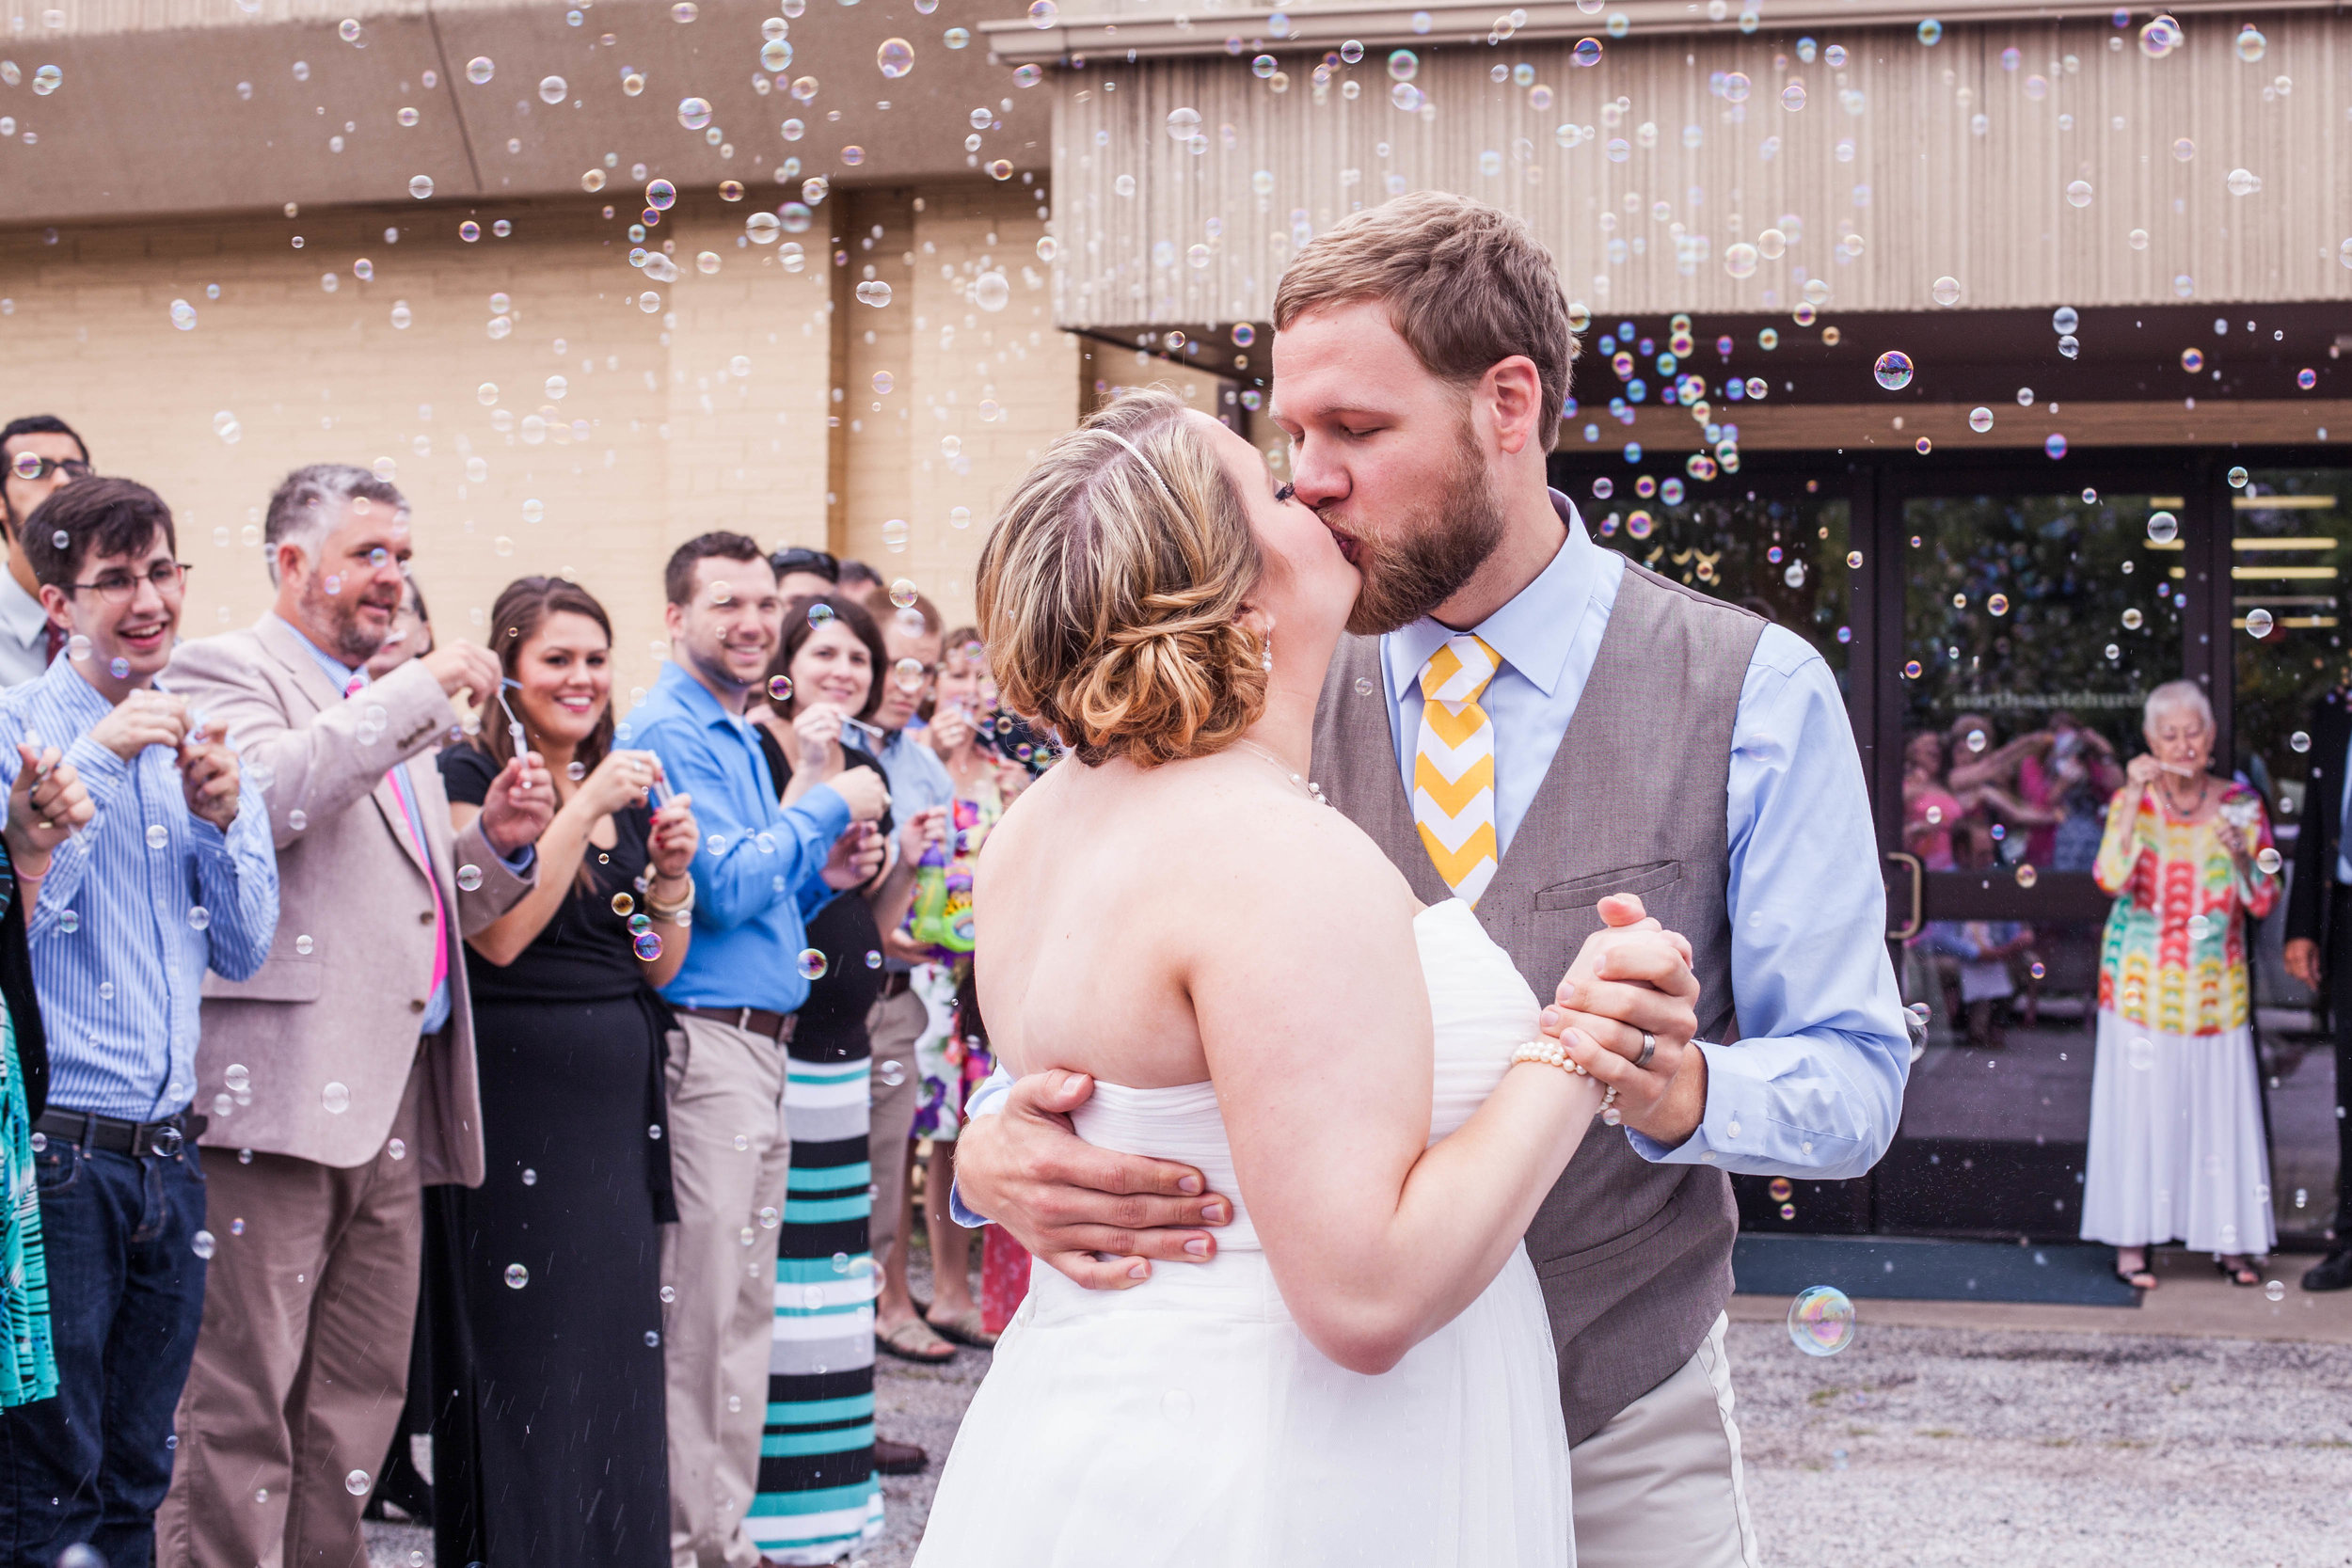 Wedding Kiss Bubbles